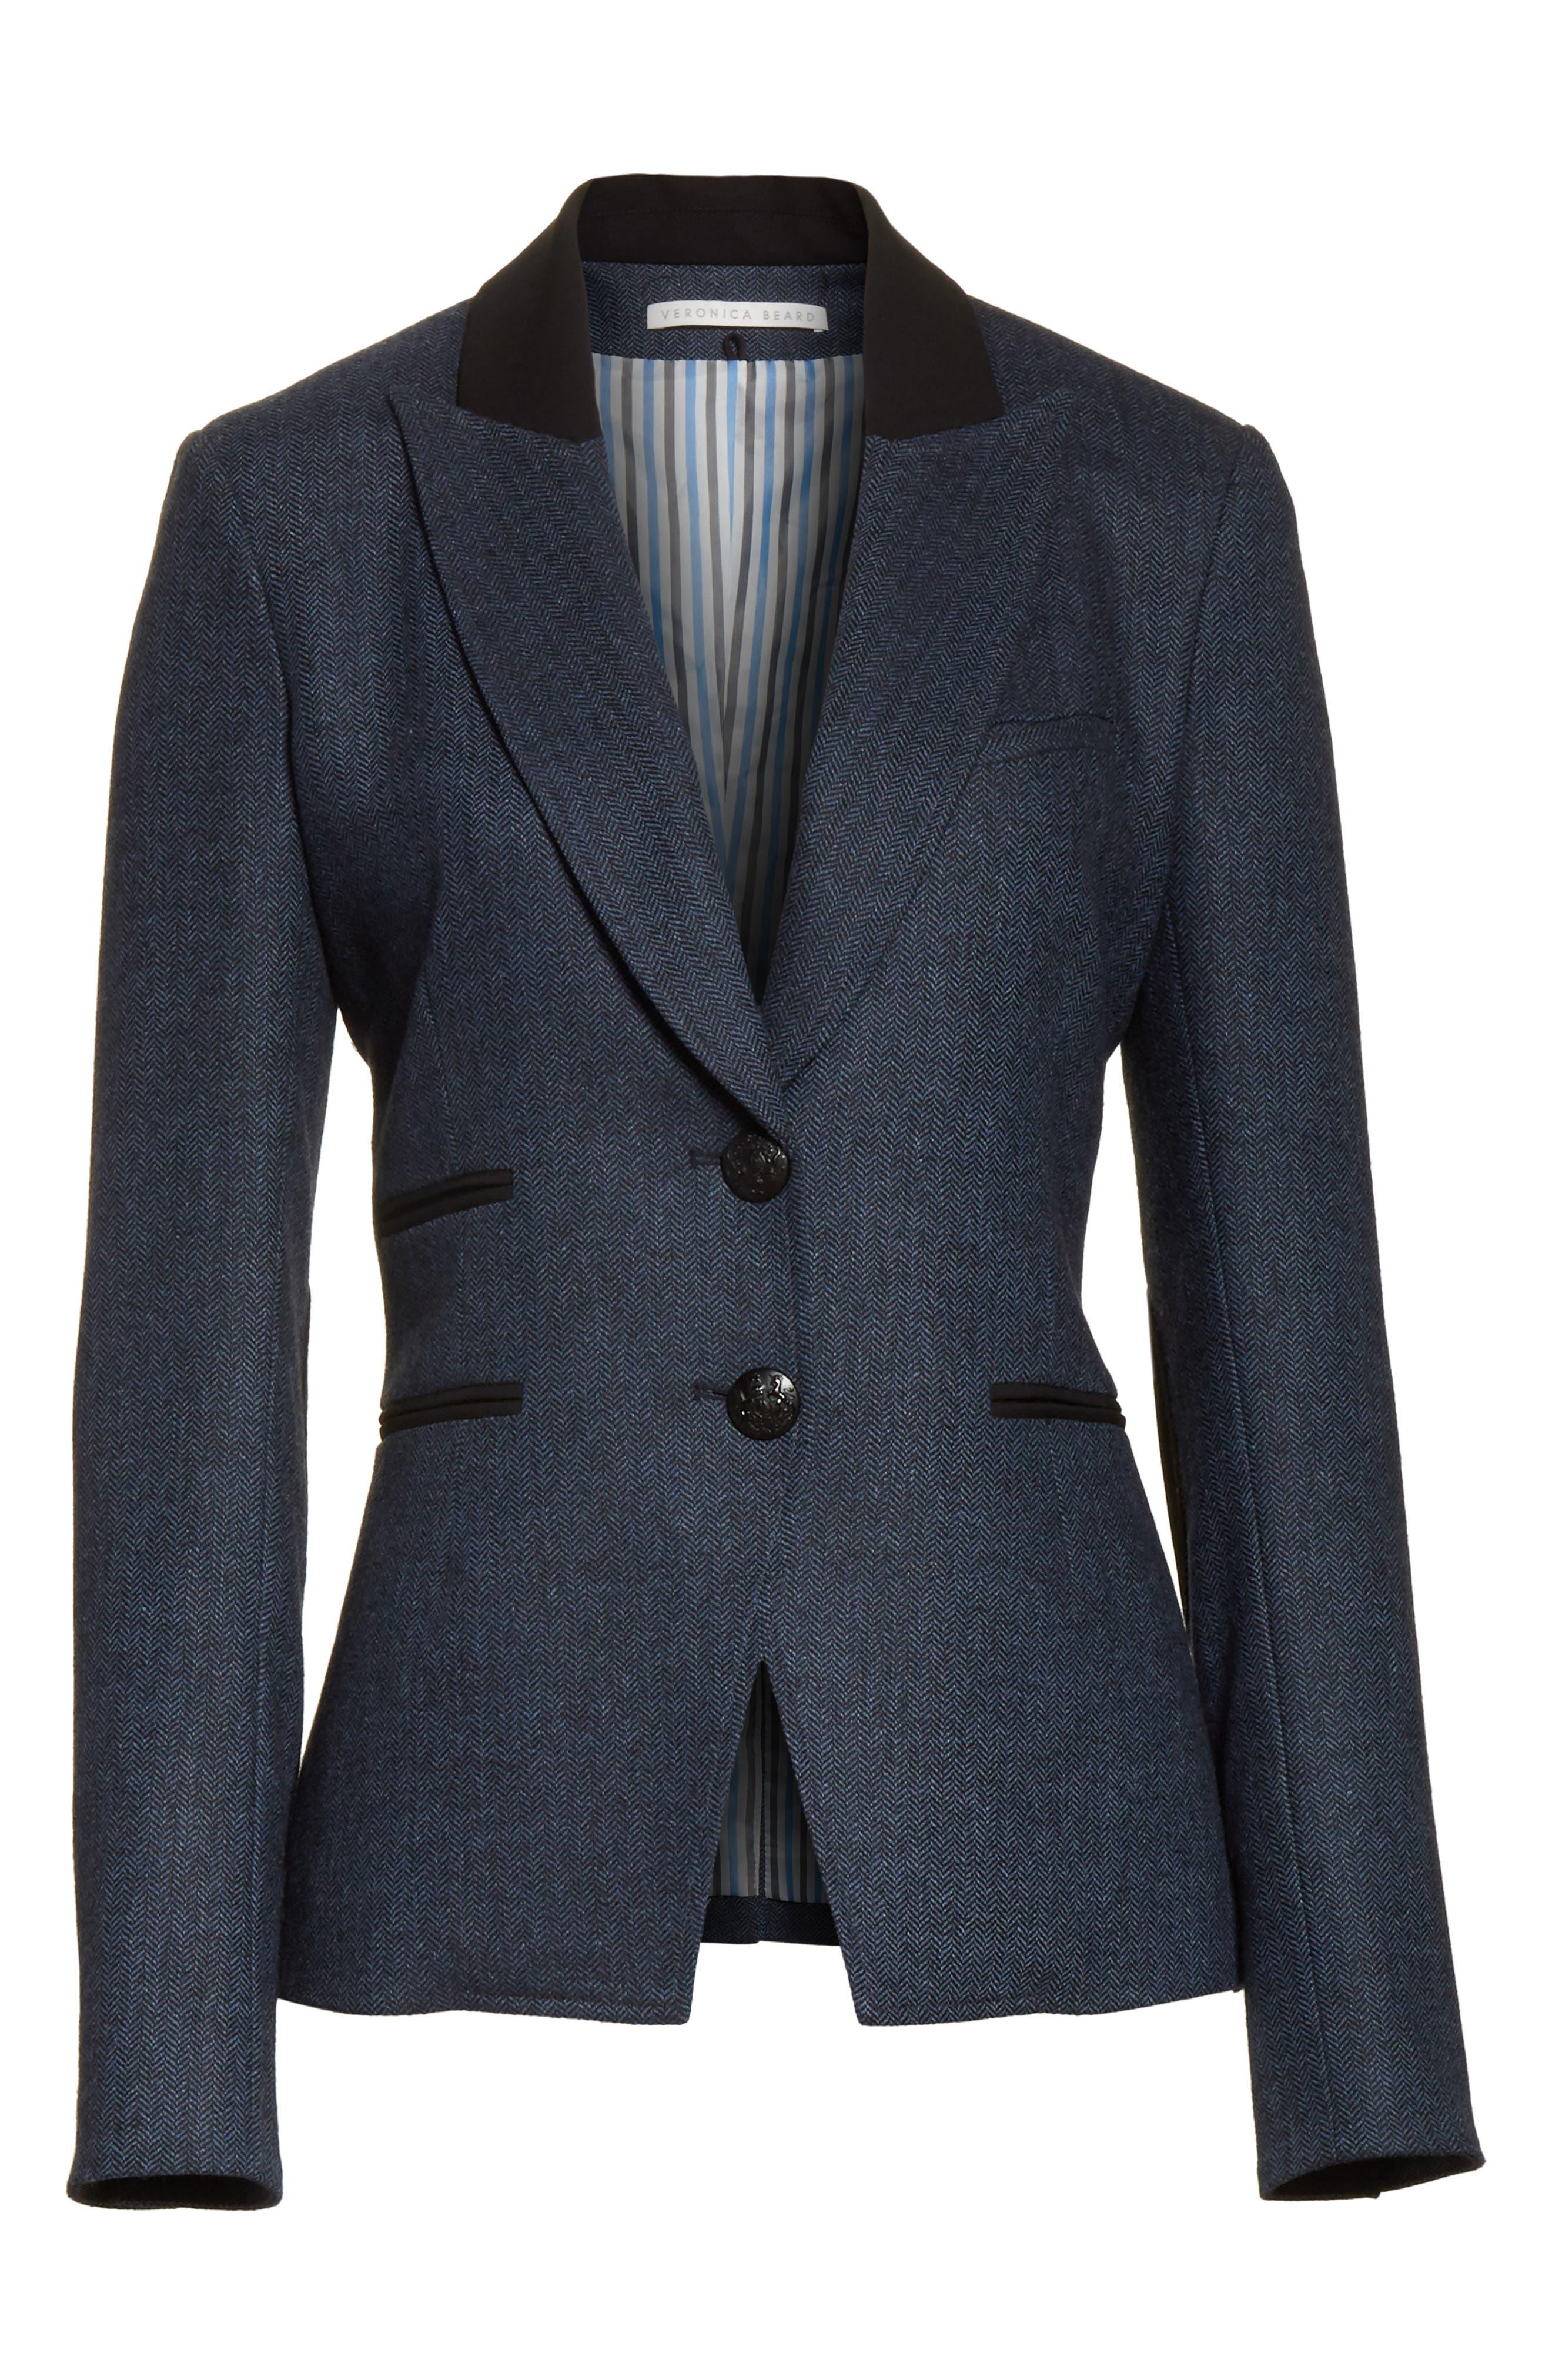 Hudson Jacket,                             Alternate thumbnail 6, color,                             Blue